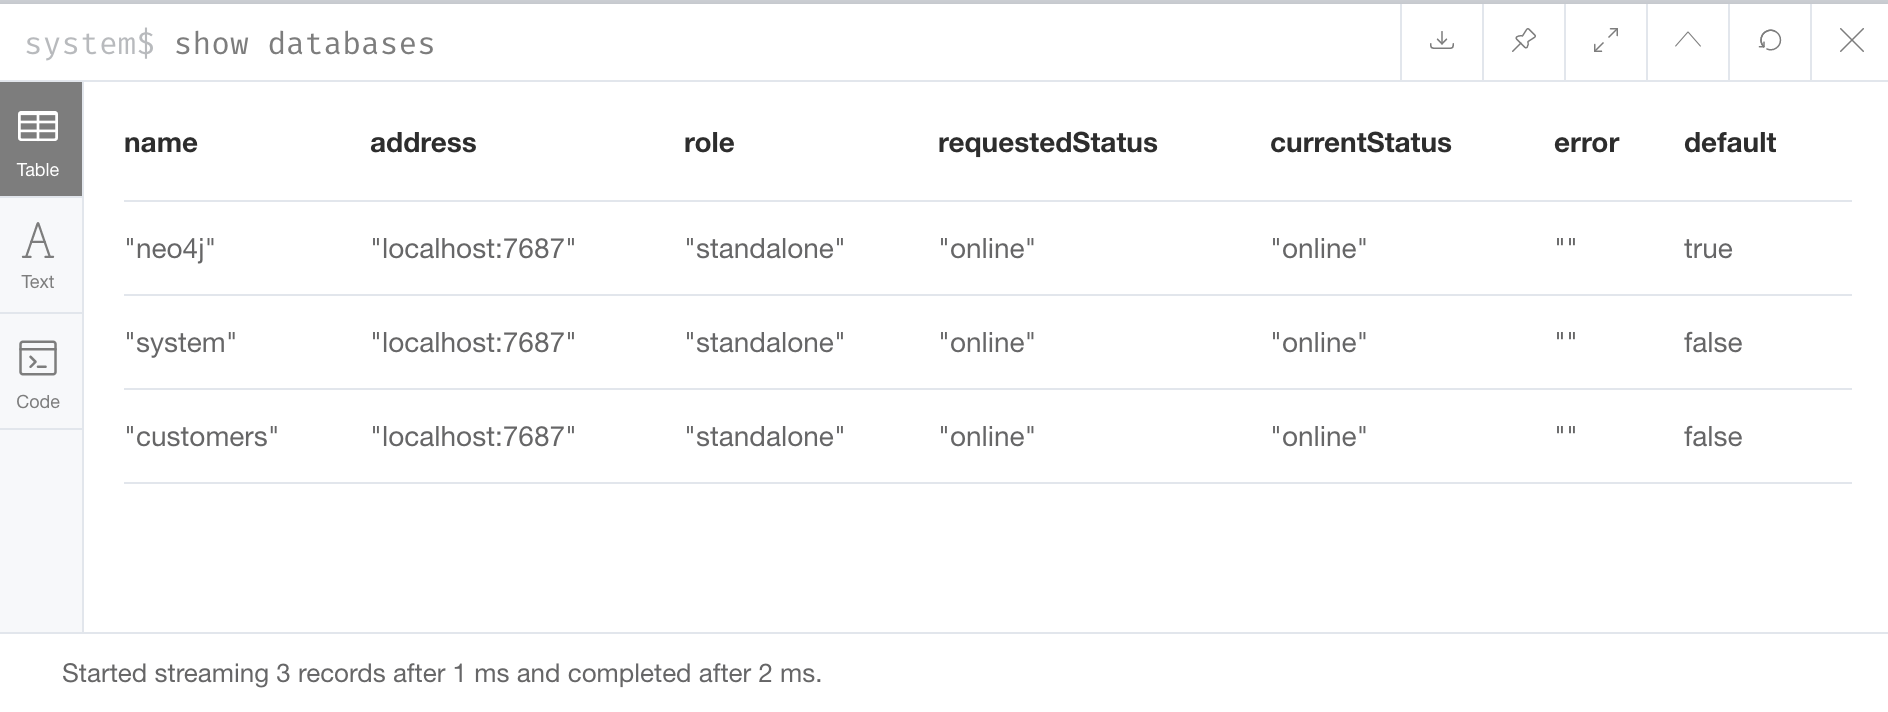 DatabaseForImport